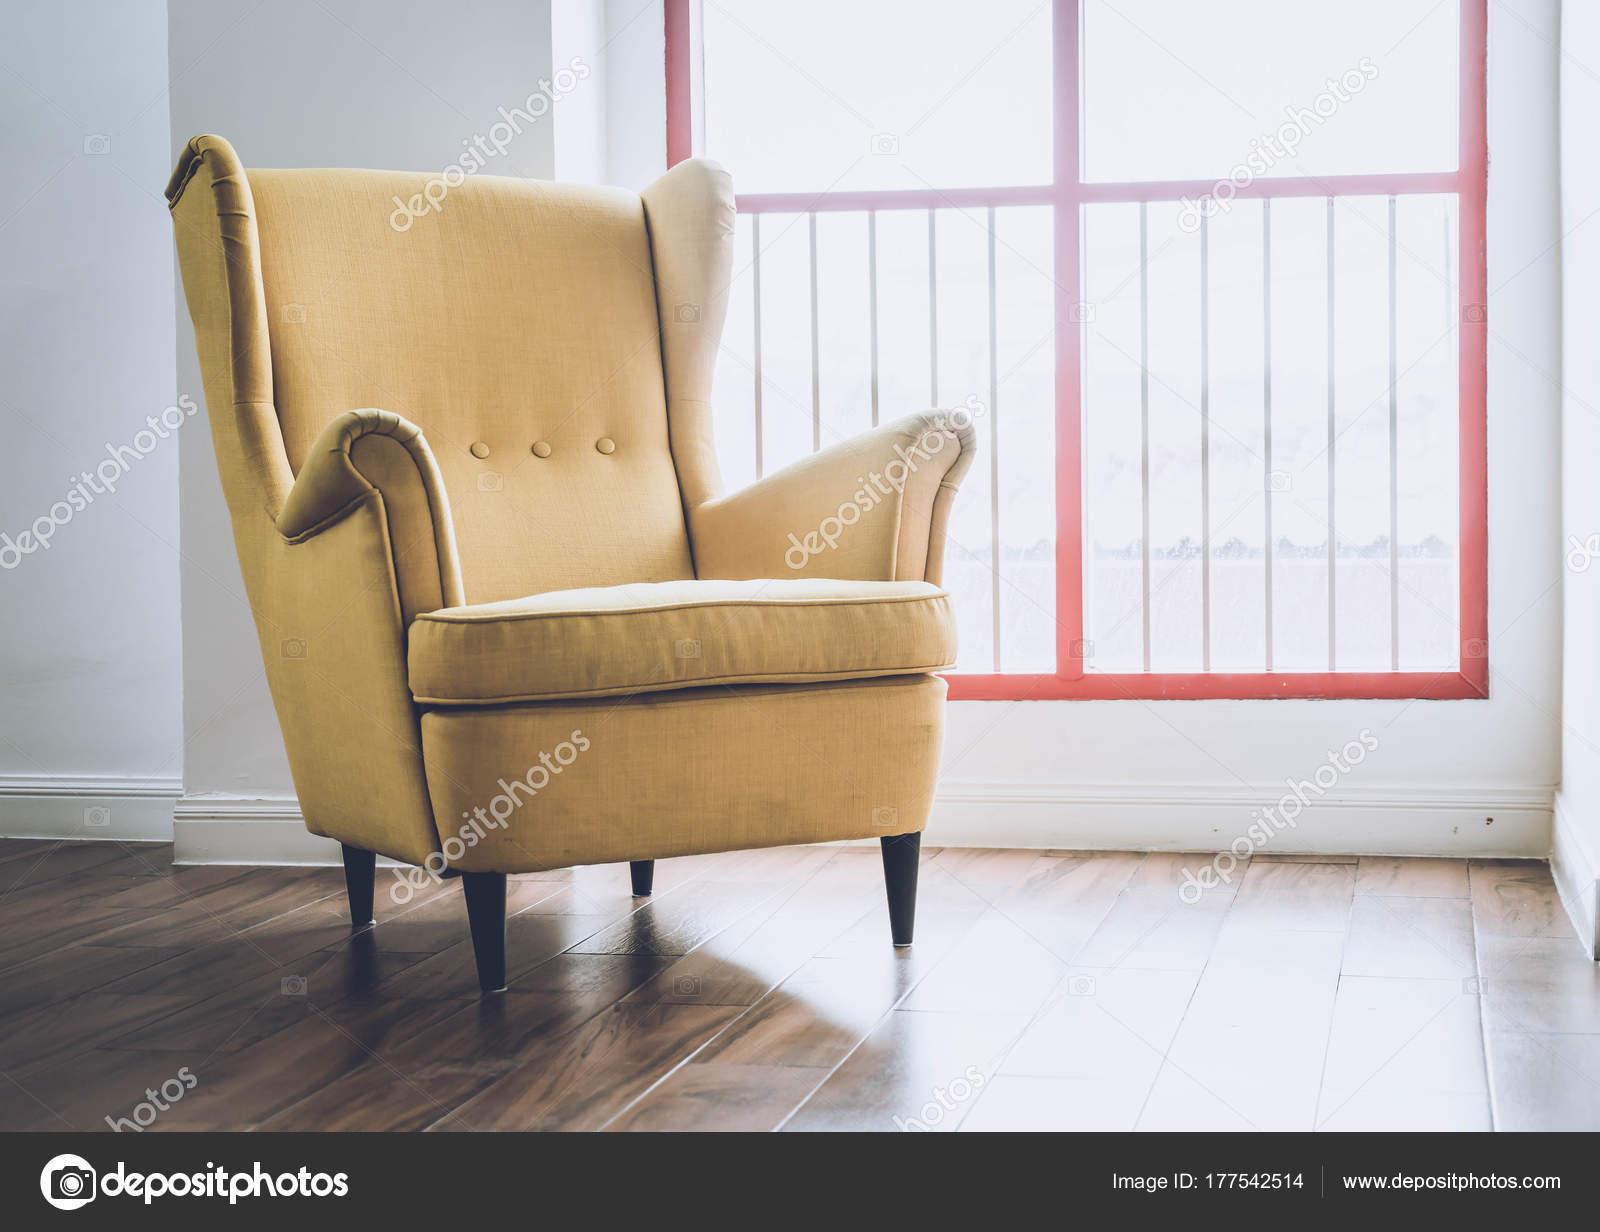 Oude fauteuil decoratie in huis u2014 stockfoto © topntp #177542514